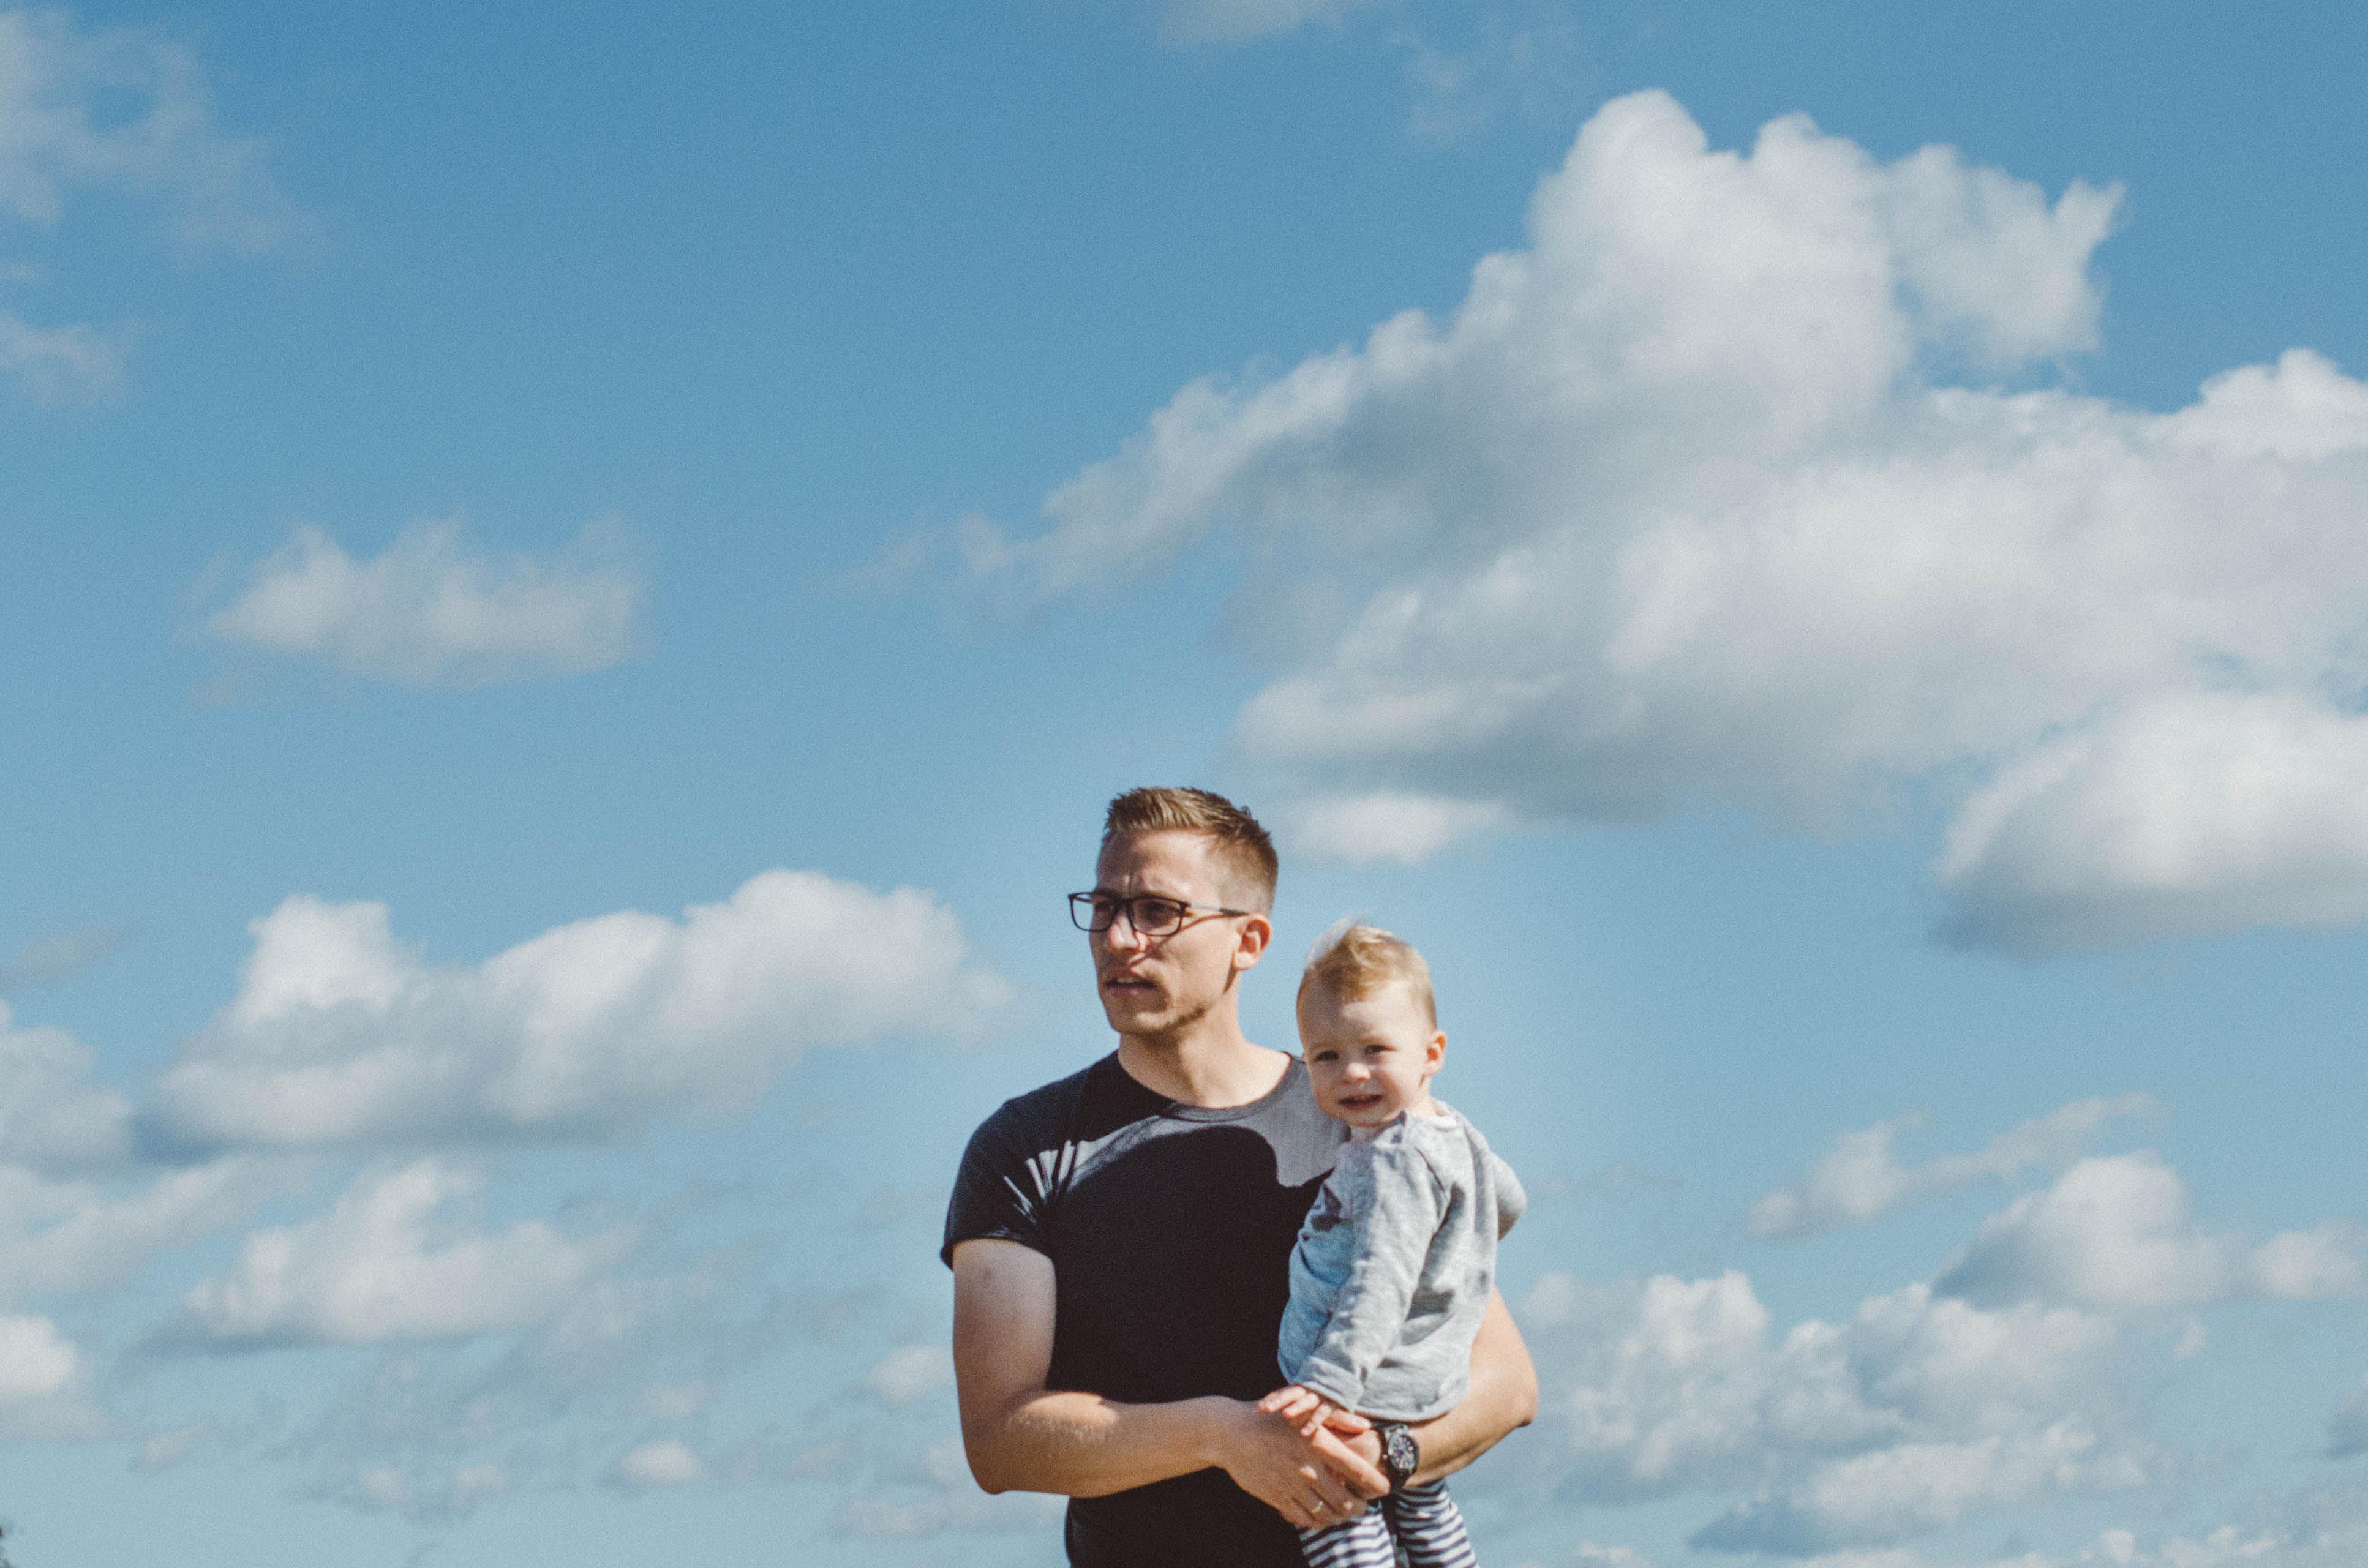 Dokumentarische-Familienfotos-Vaterliebe